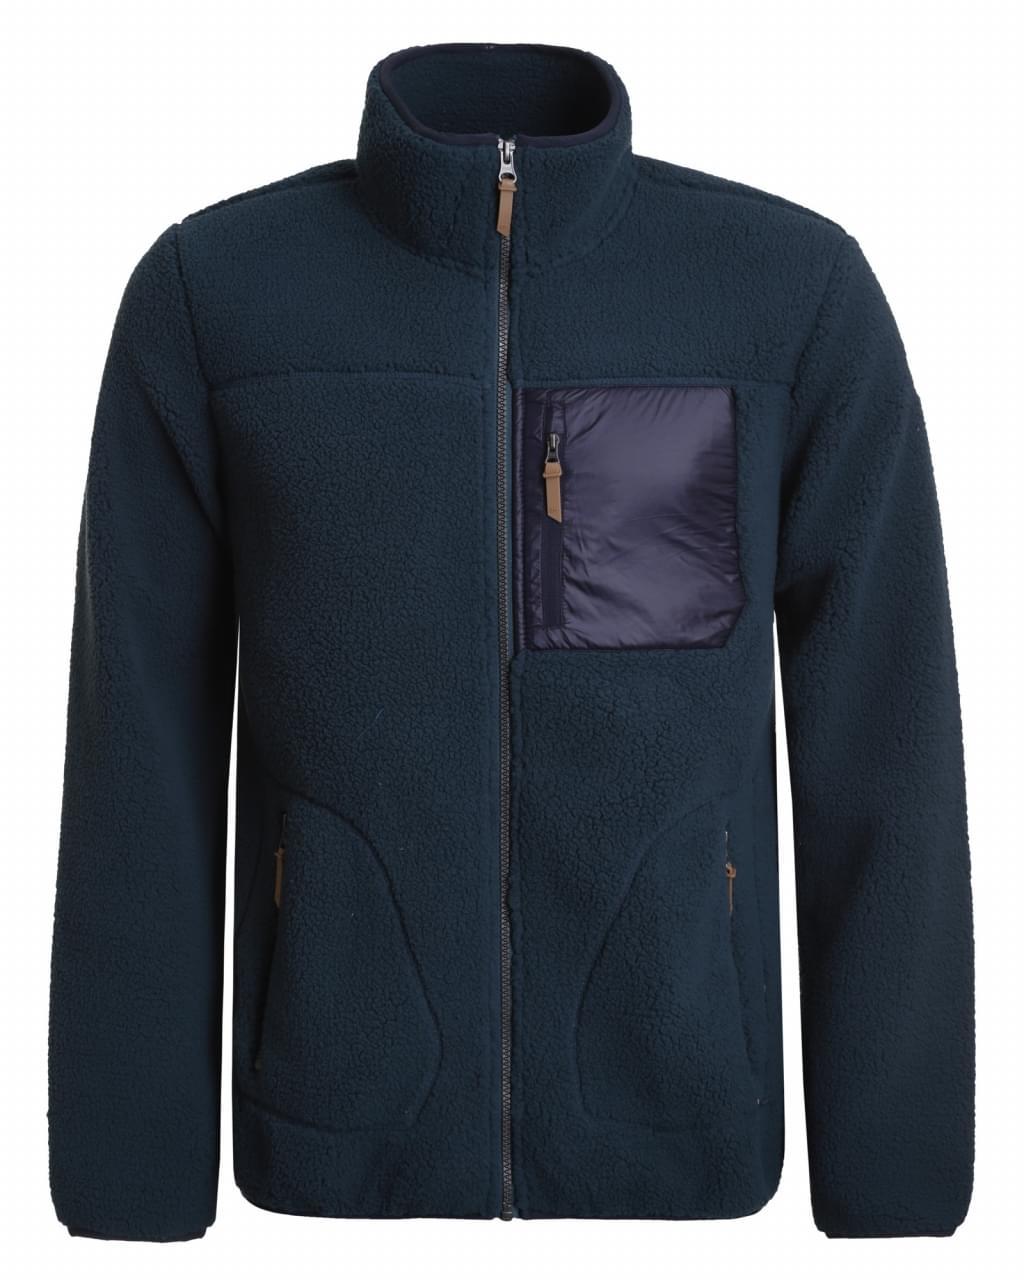 Icepeak Ep Amherst Fleece Jacket Dames Groen